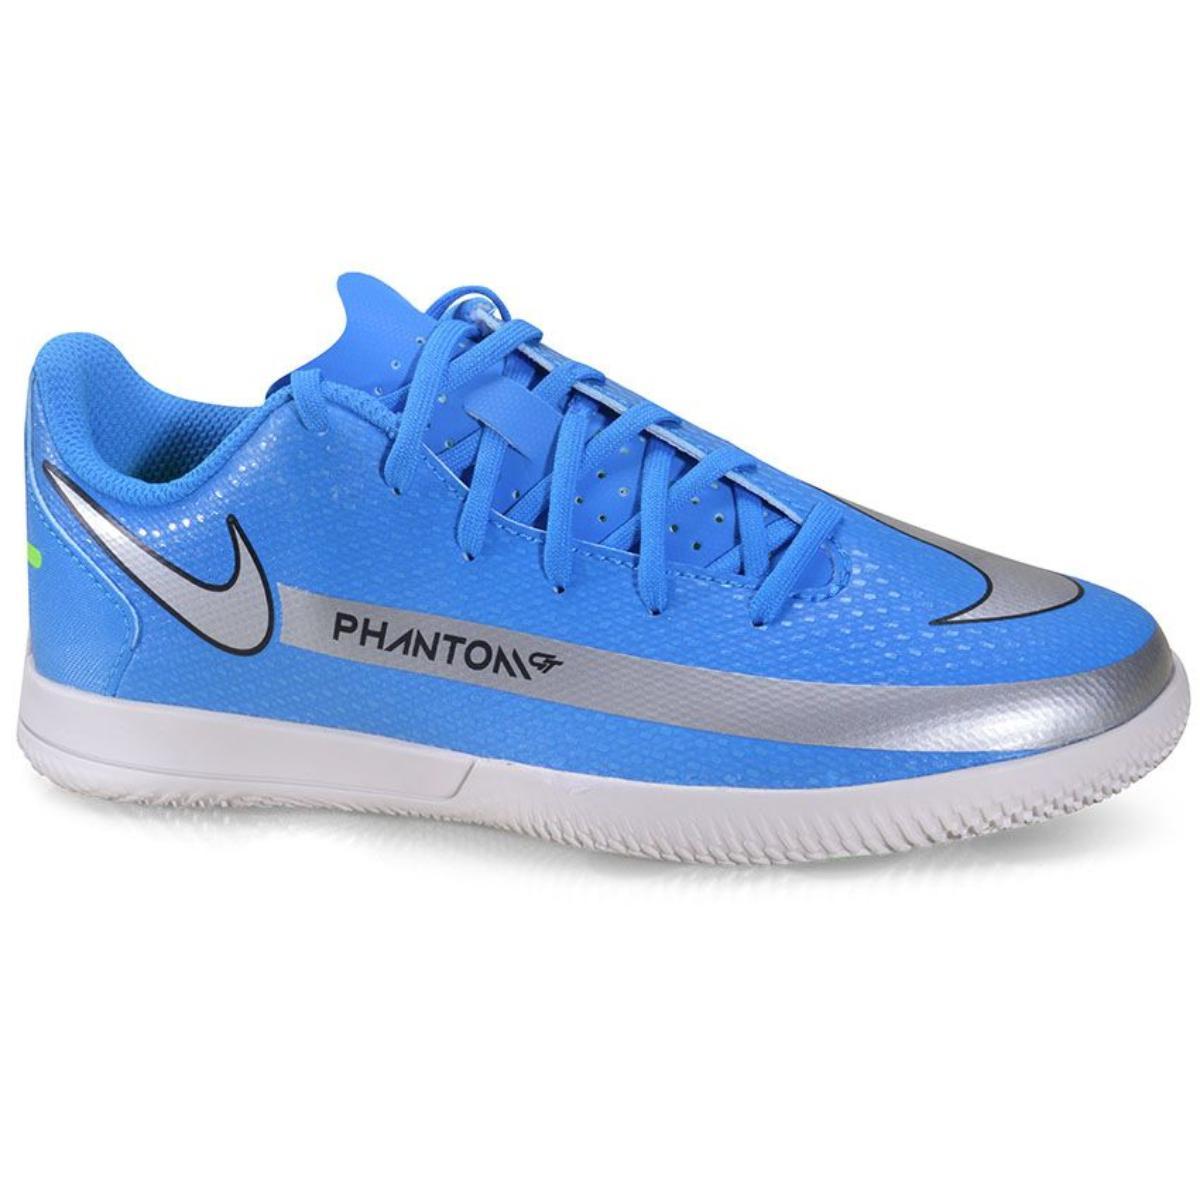 Tênis Masc Infantil Nike Ck8481-400 jr Phantom gt Club ic Azul/cinza